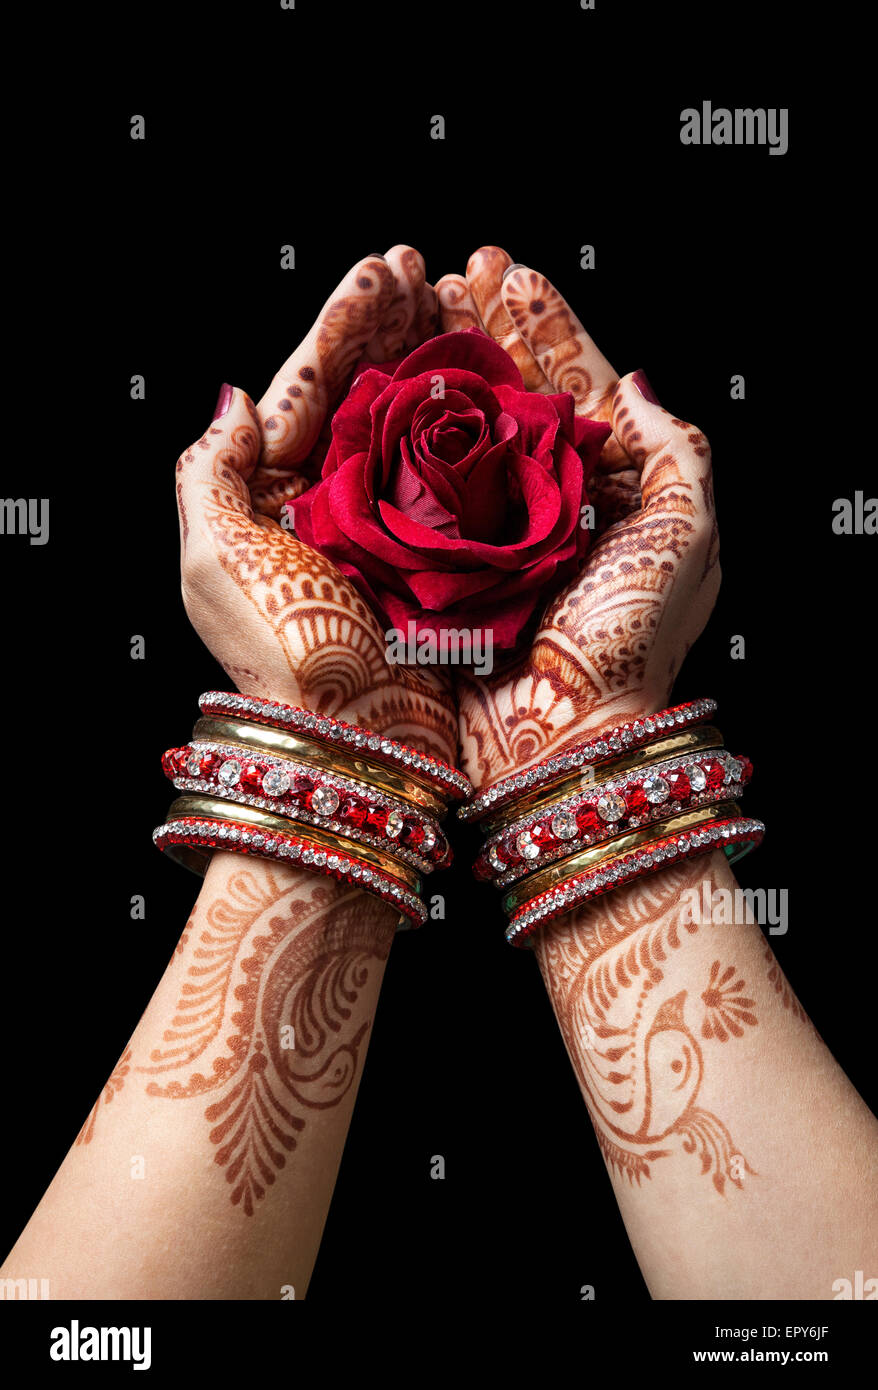 Mujer de manos con henna celebración rosa roja aislado sobre fondo negro con trazado de recorte Imagen De Stock